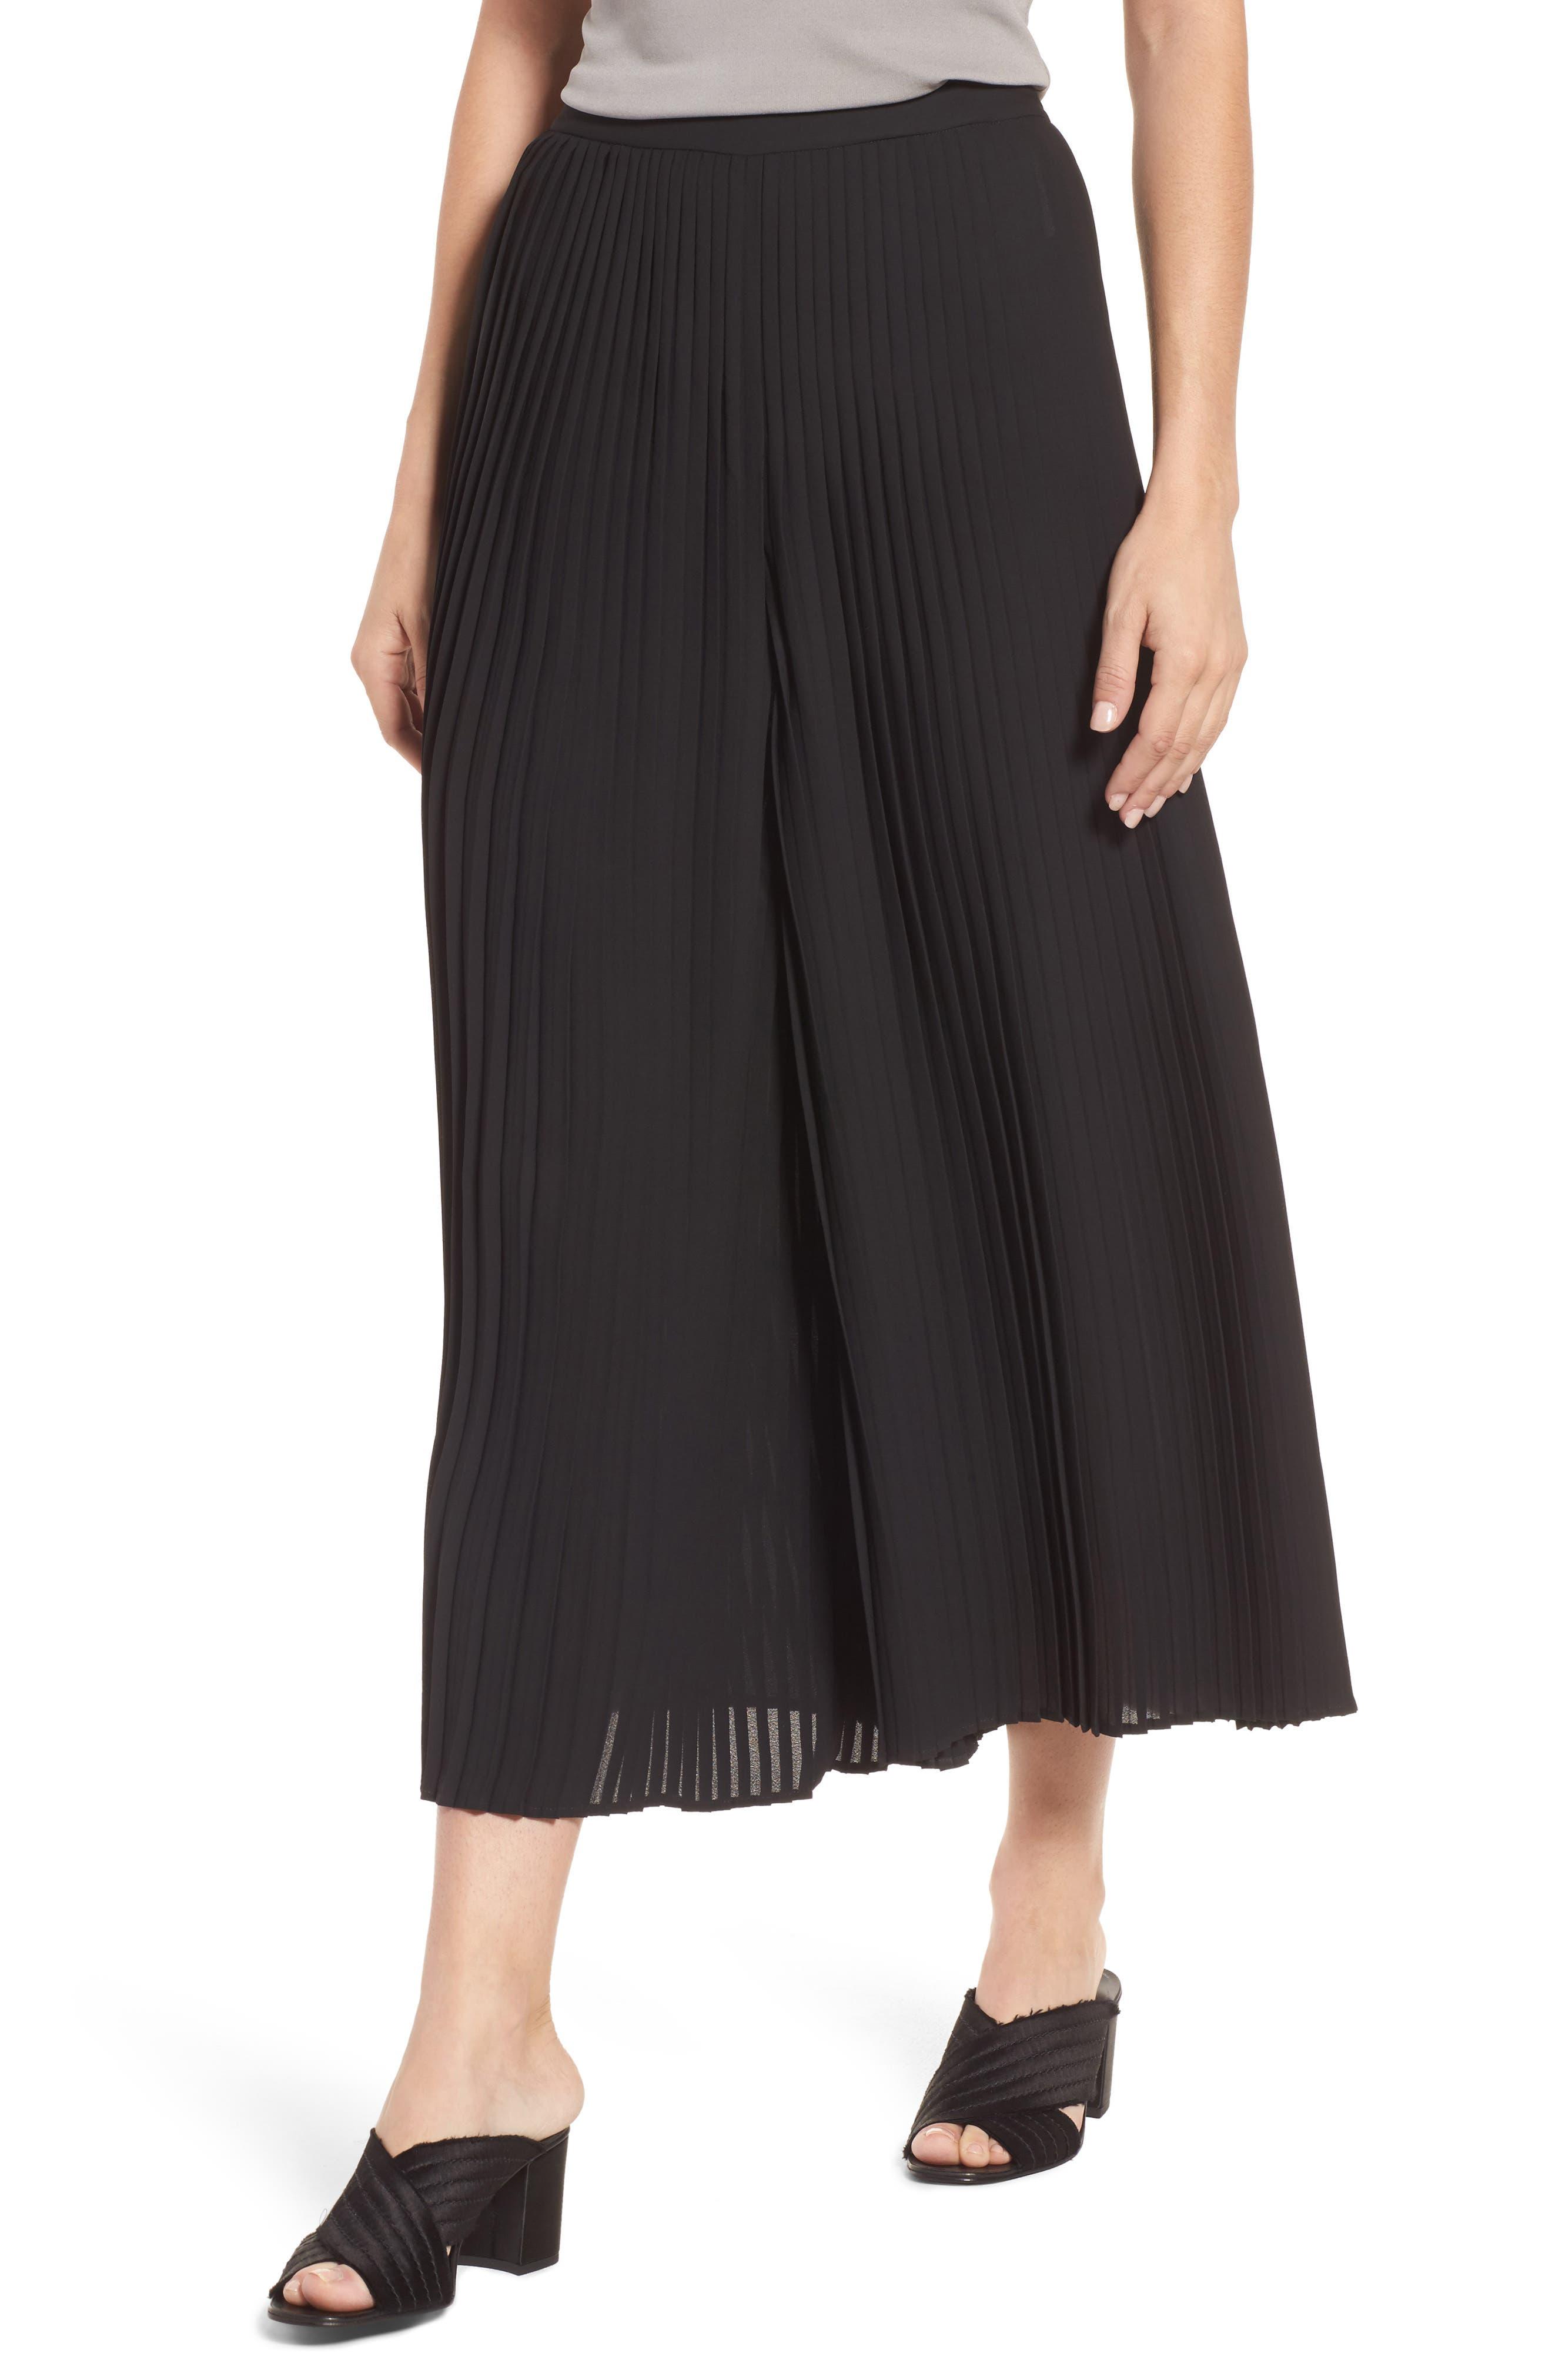 Alternate Image 1 Selected - Eileen Fisher Wide Leg Ankle Pants (Regular & Petite)